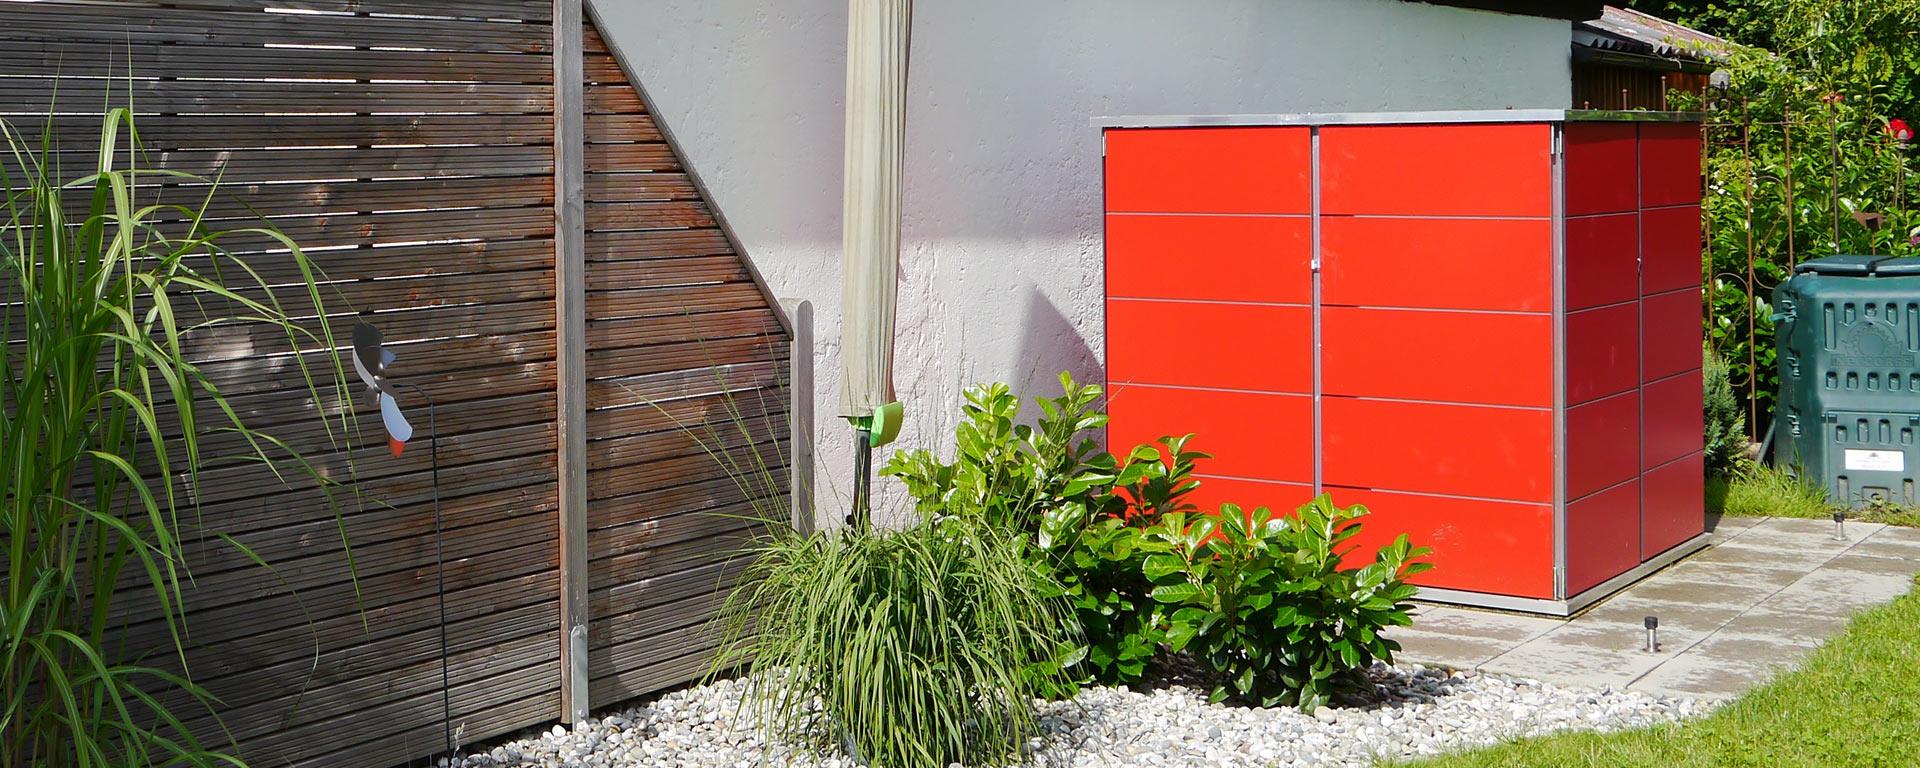 Gartenhaus klein cube garten q gmbh - Alternative gartenhaus ...